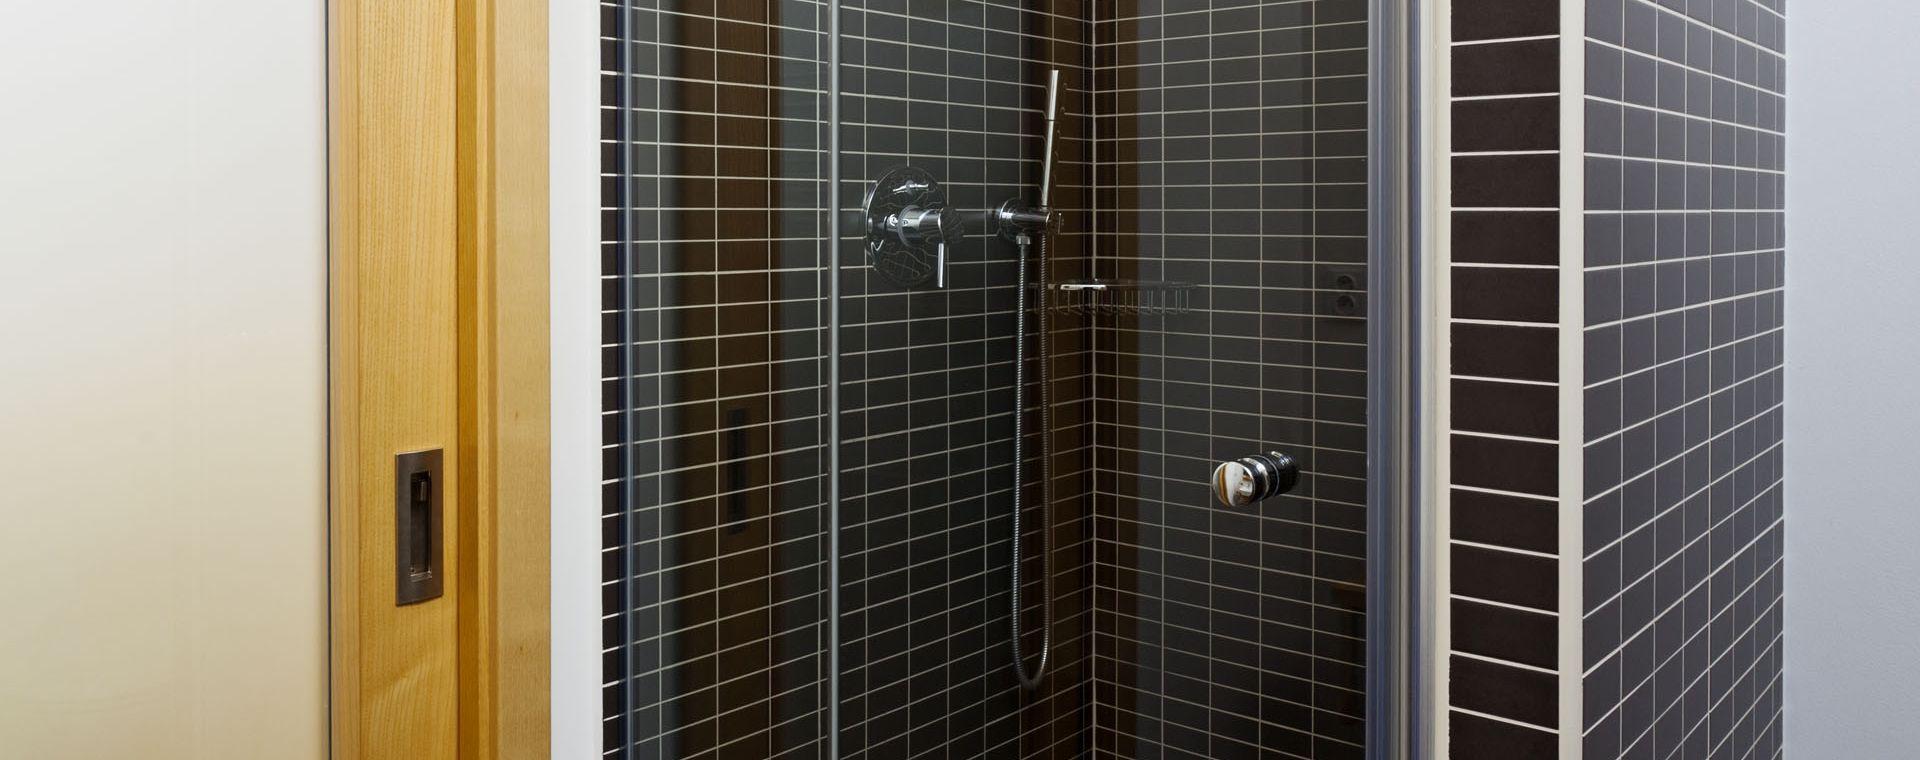 Realizace koupelny - Praha Vinohrady, Praha, 2010-2011, CZ